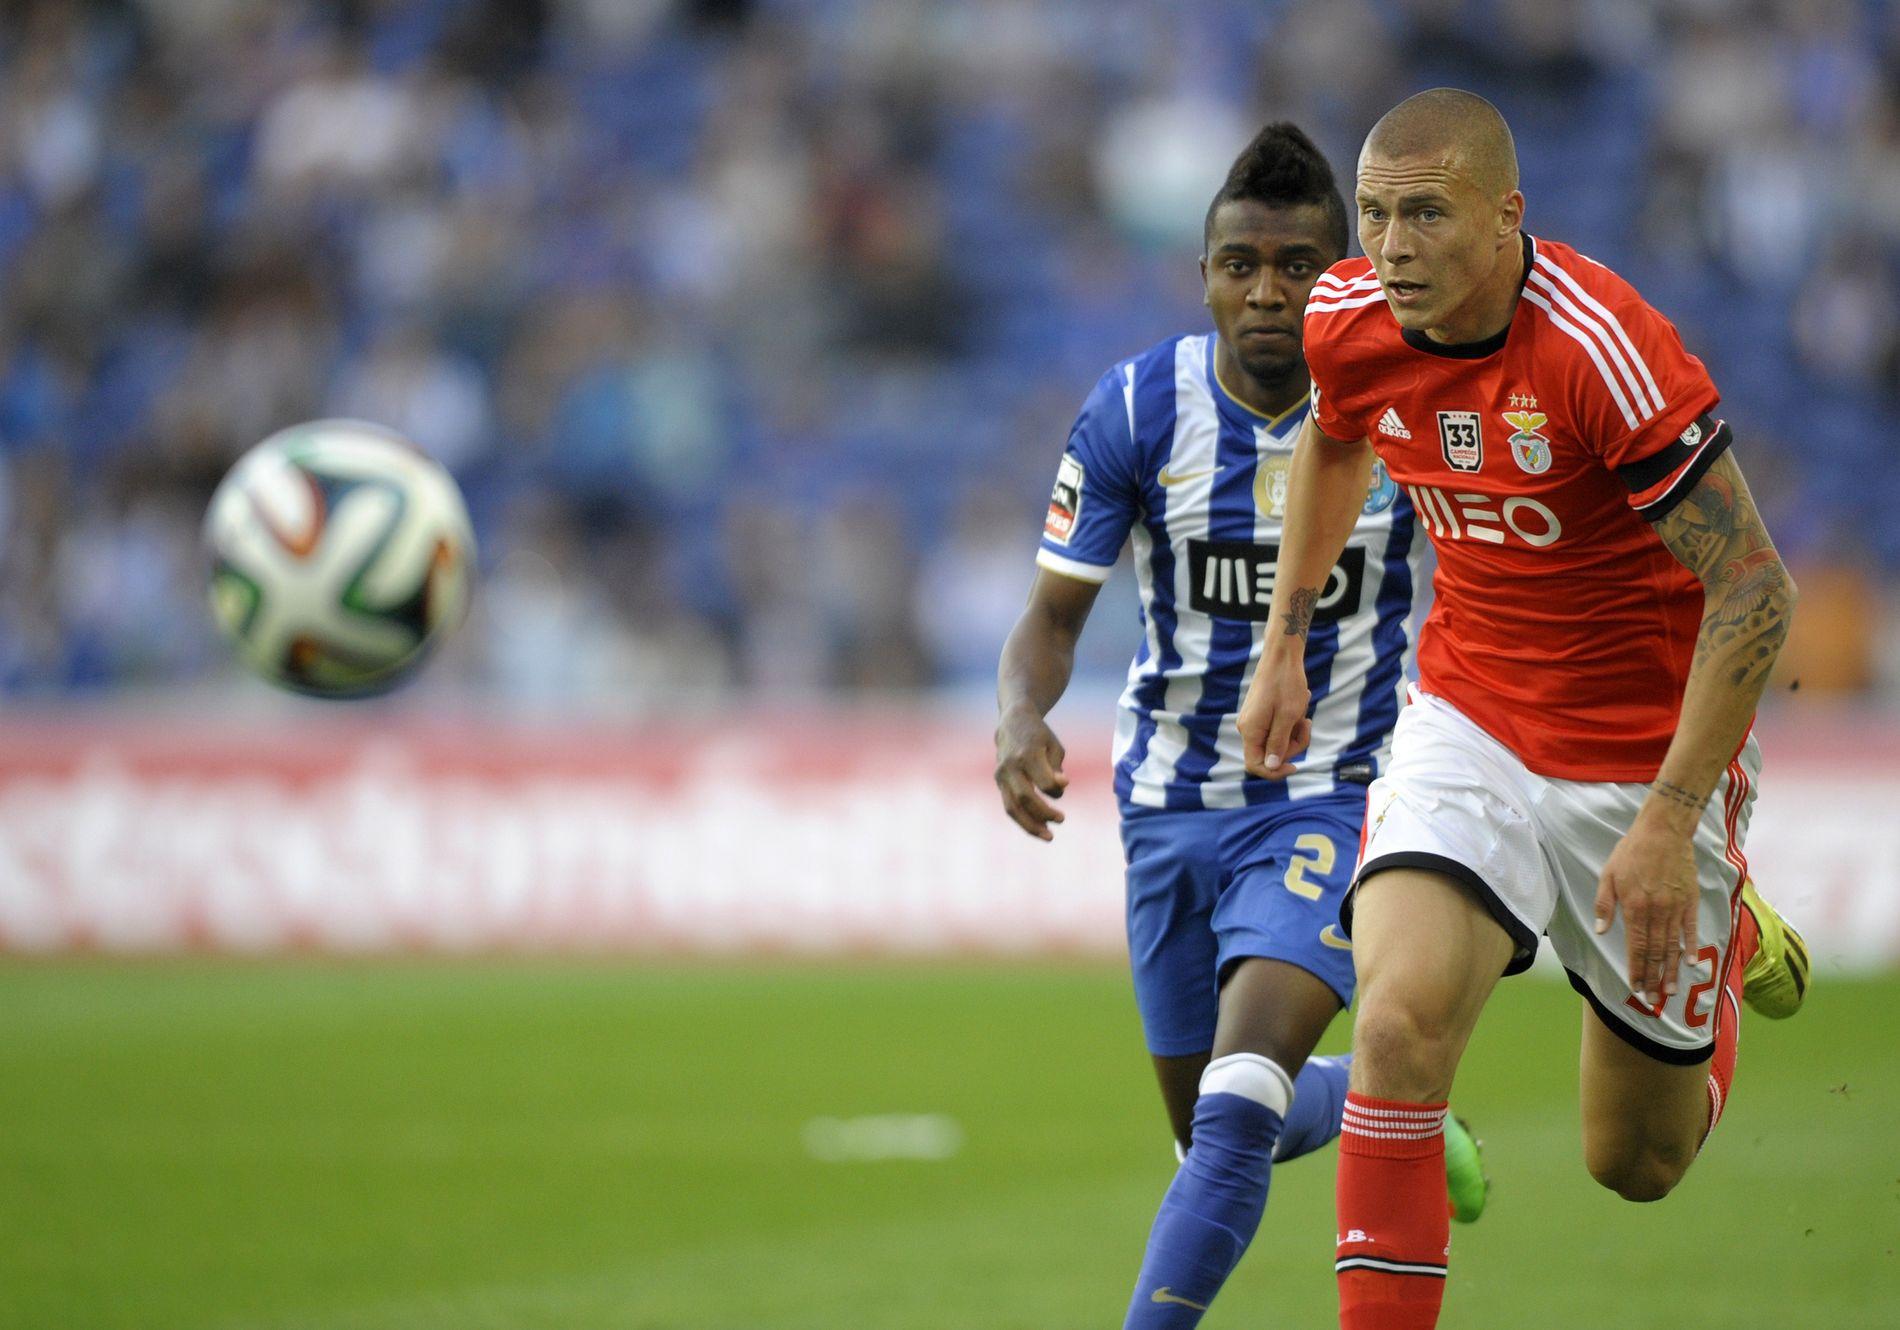 KONTROLL: Victor Lindelöf har hatt god kontroll på spissene i den portugisiske ligaen. Her er han først på ballen i duell med Porto-spissen Kelvin Oliveira i 2014.